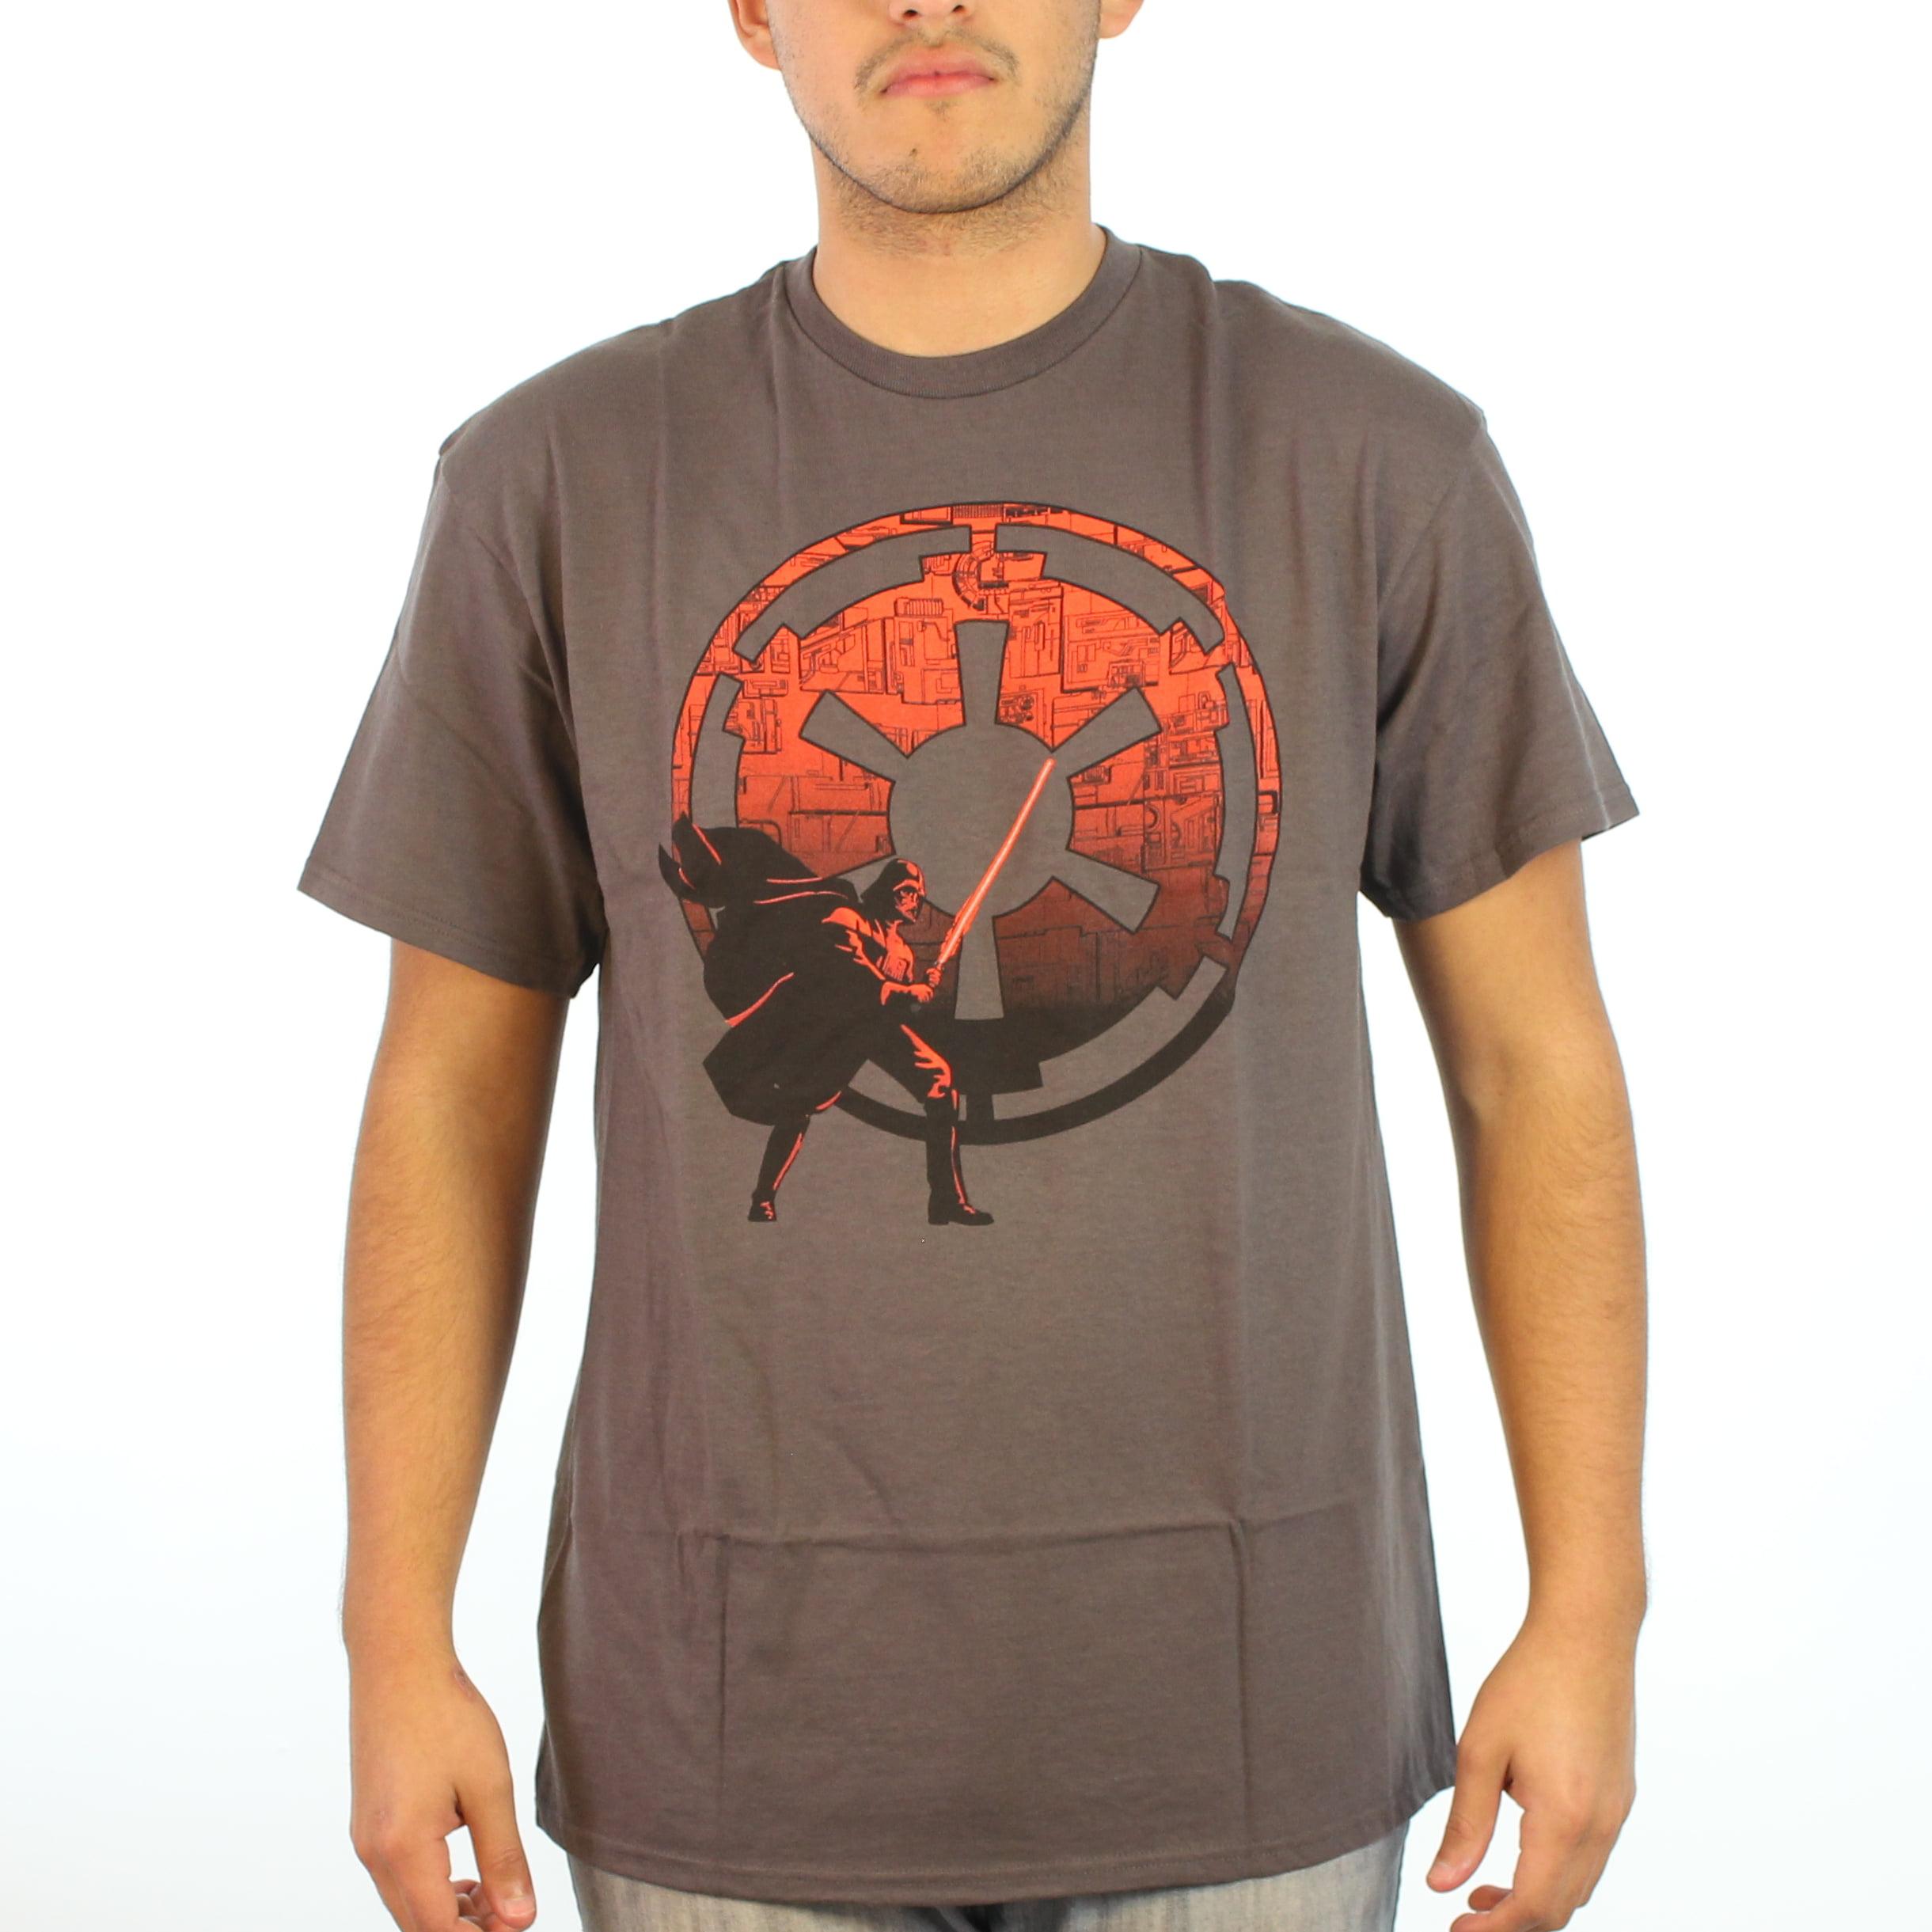 Star Wars Darth Vader Milenium Falcon Background Men's Brown T-shirt